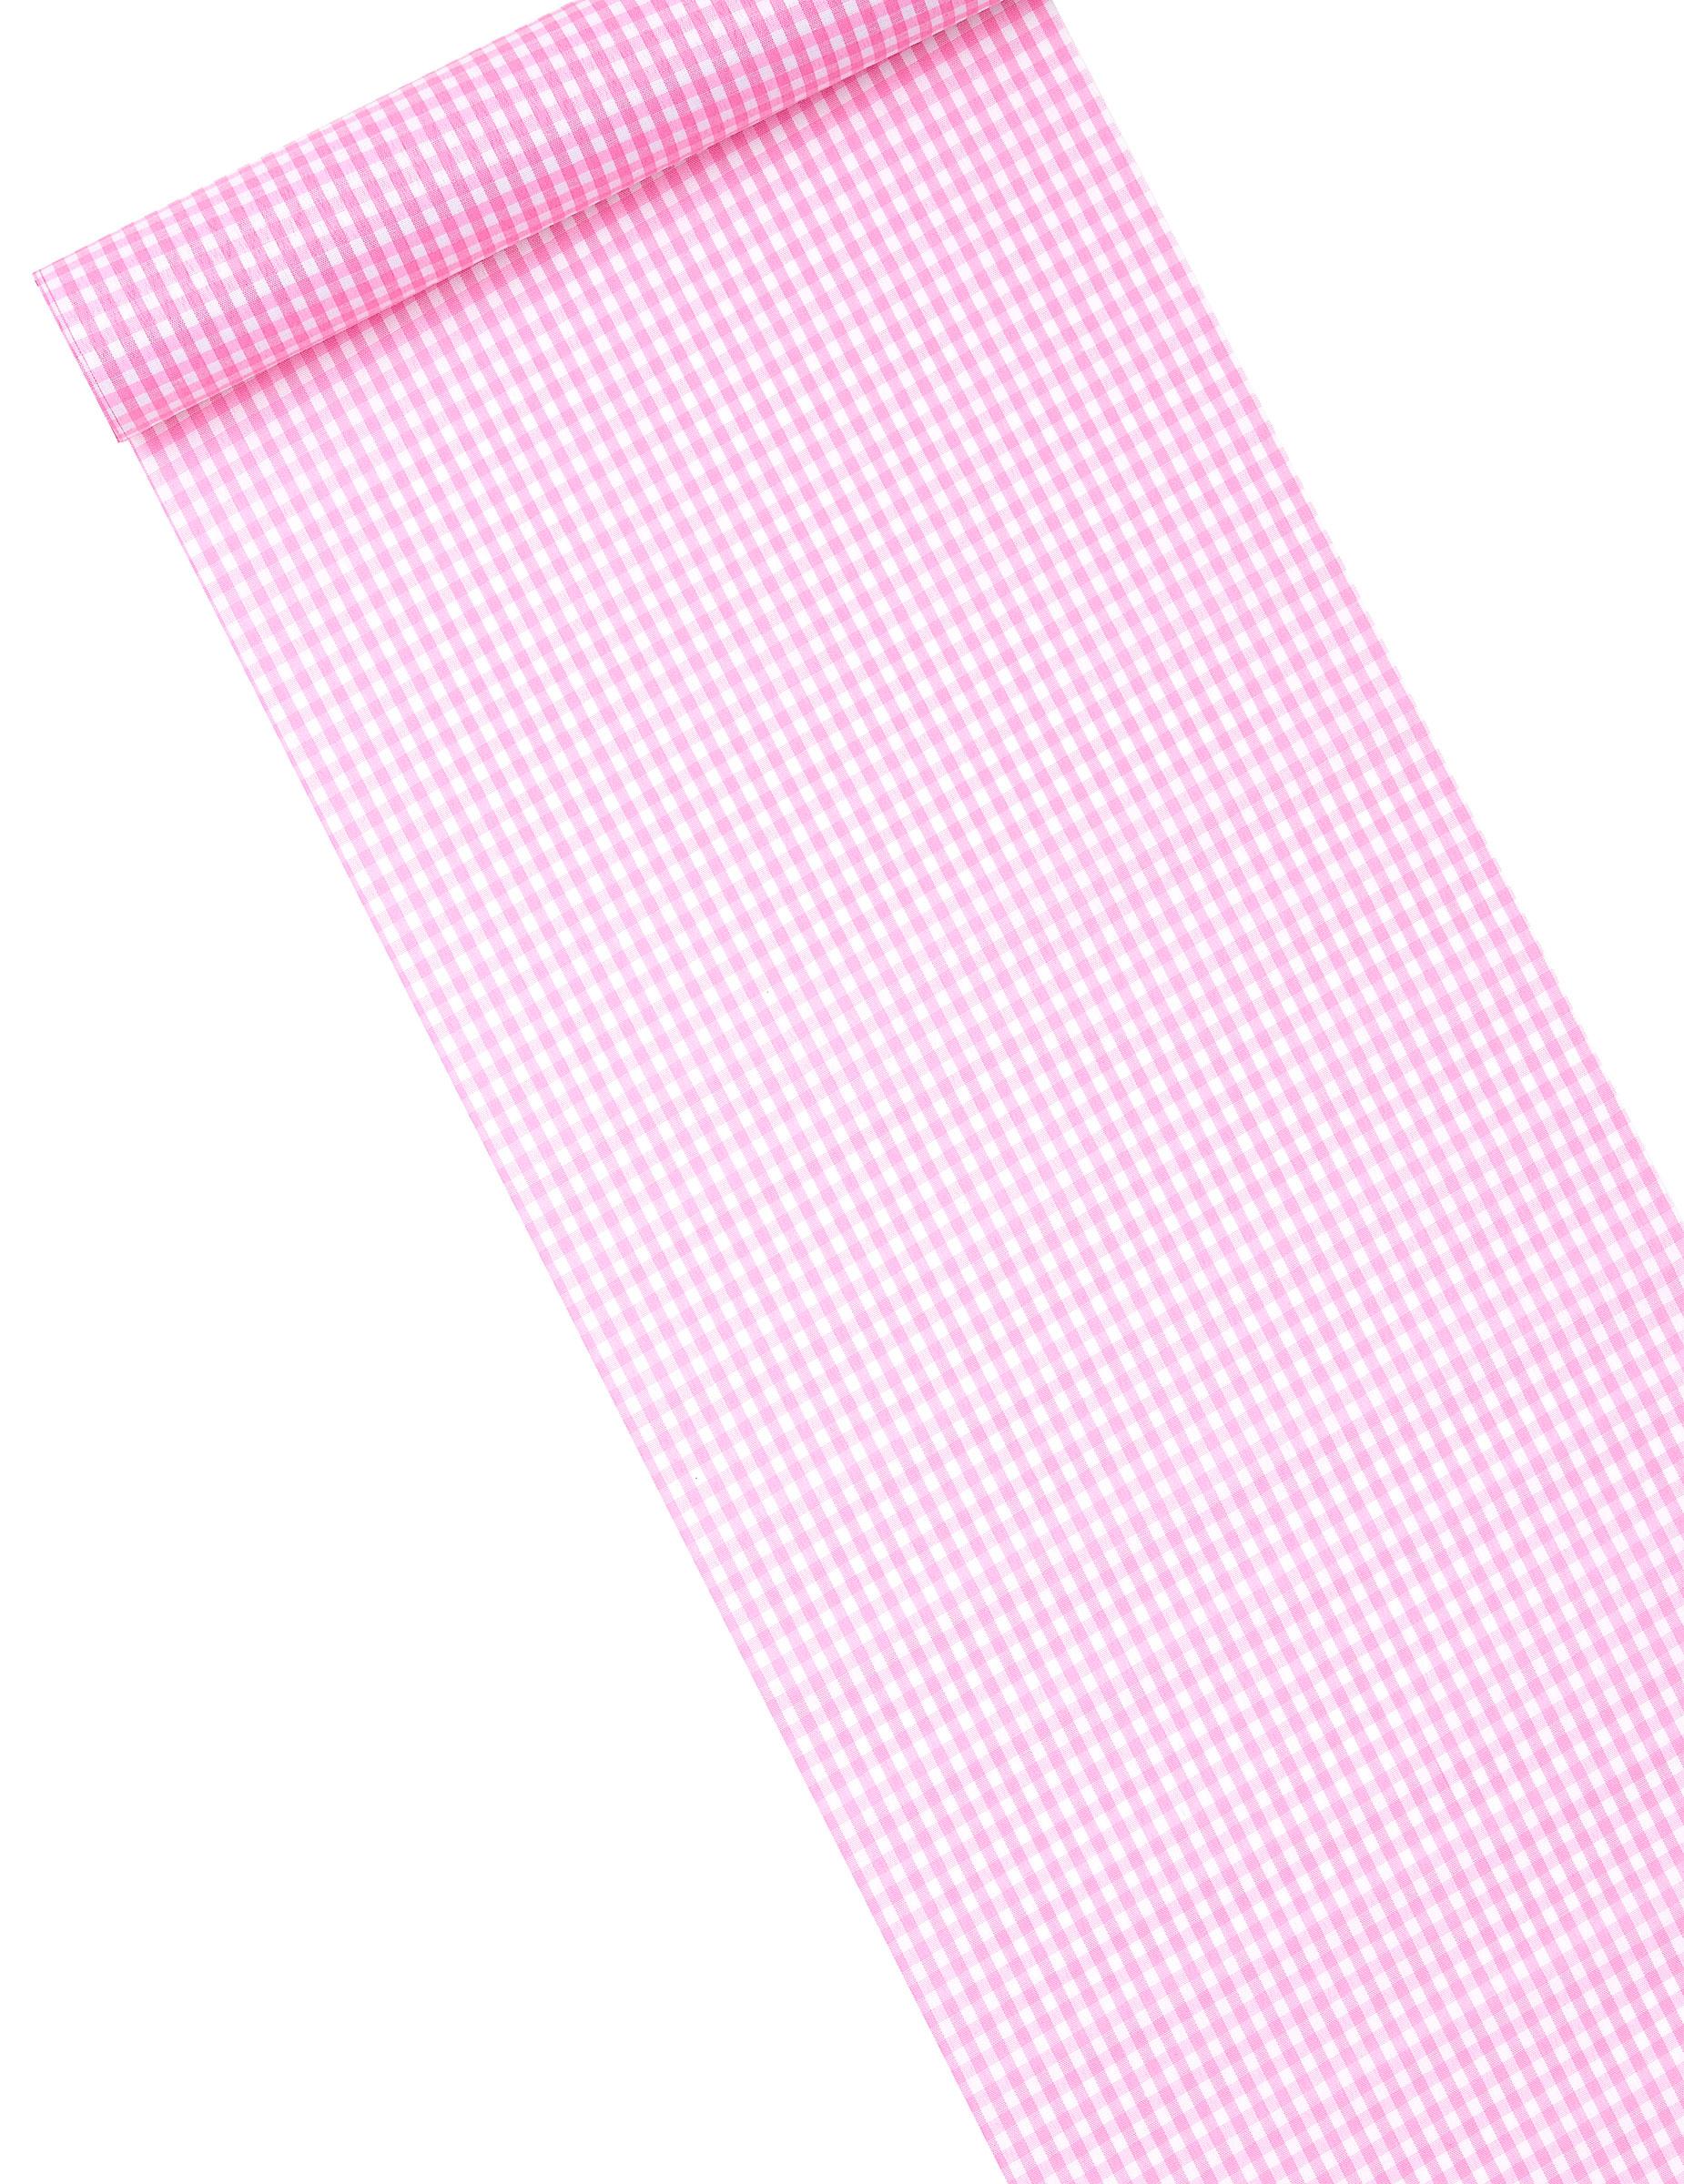 Chemin de table tissu vichy rose 5m d coration for Chemin de table personnalise